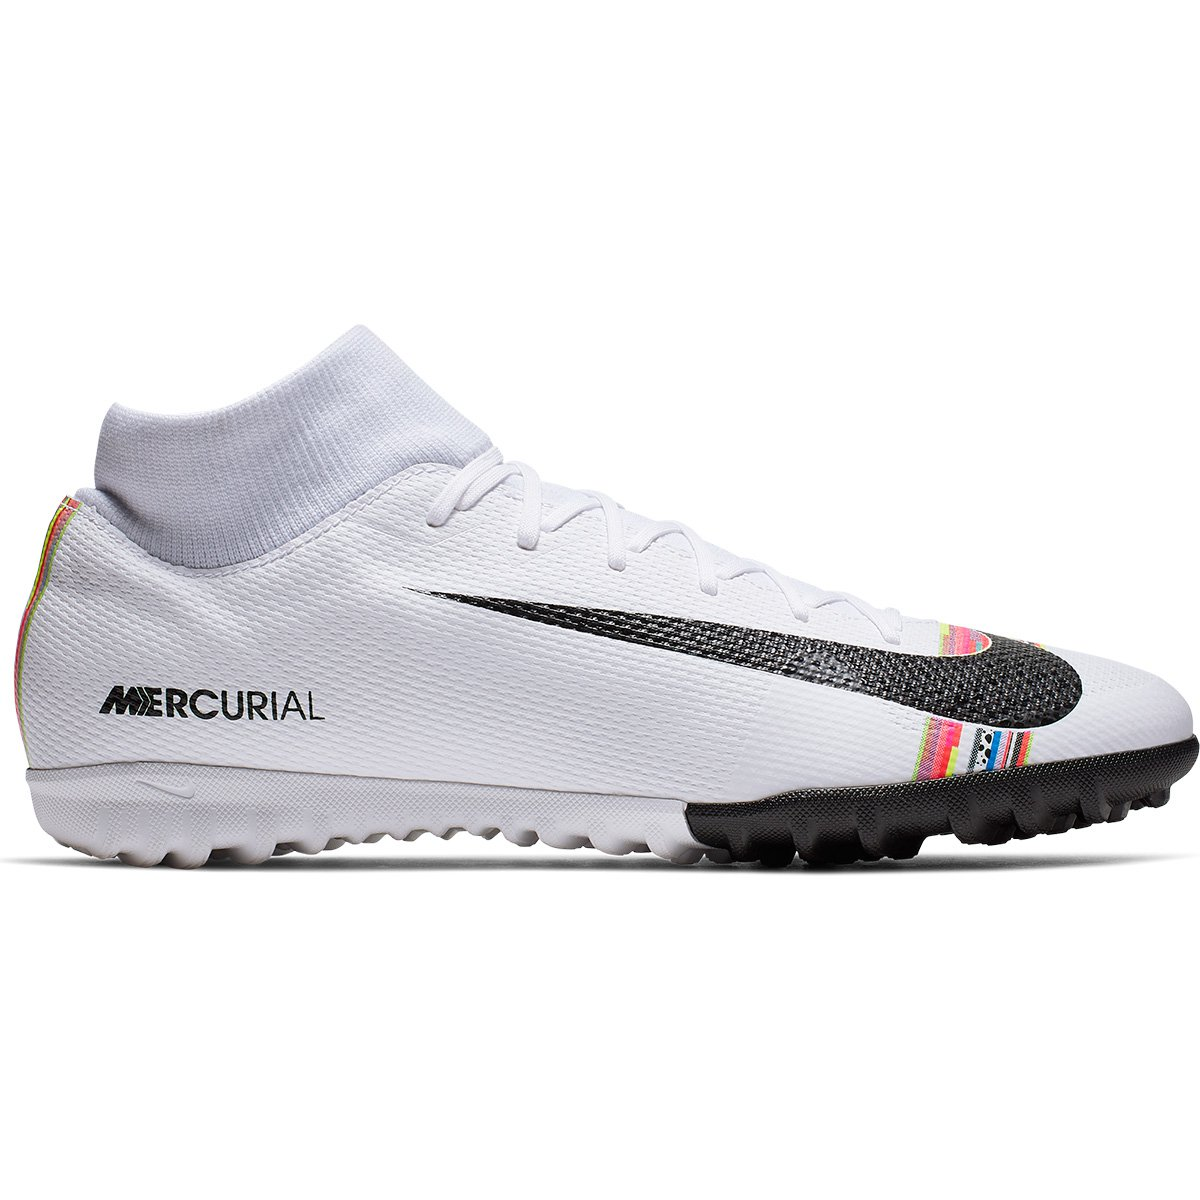 72c5e7f987 Chuteira Society Nike Mercurial Superfly 6 Academy CR7 TF - Branco e Preto  - Compre Agora